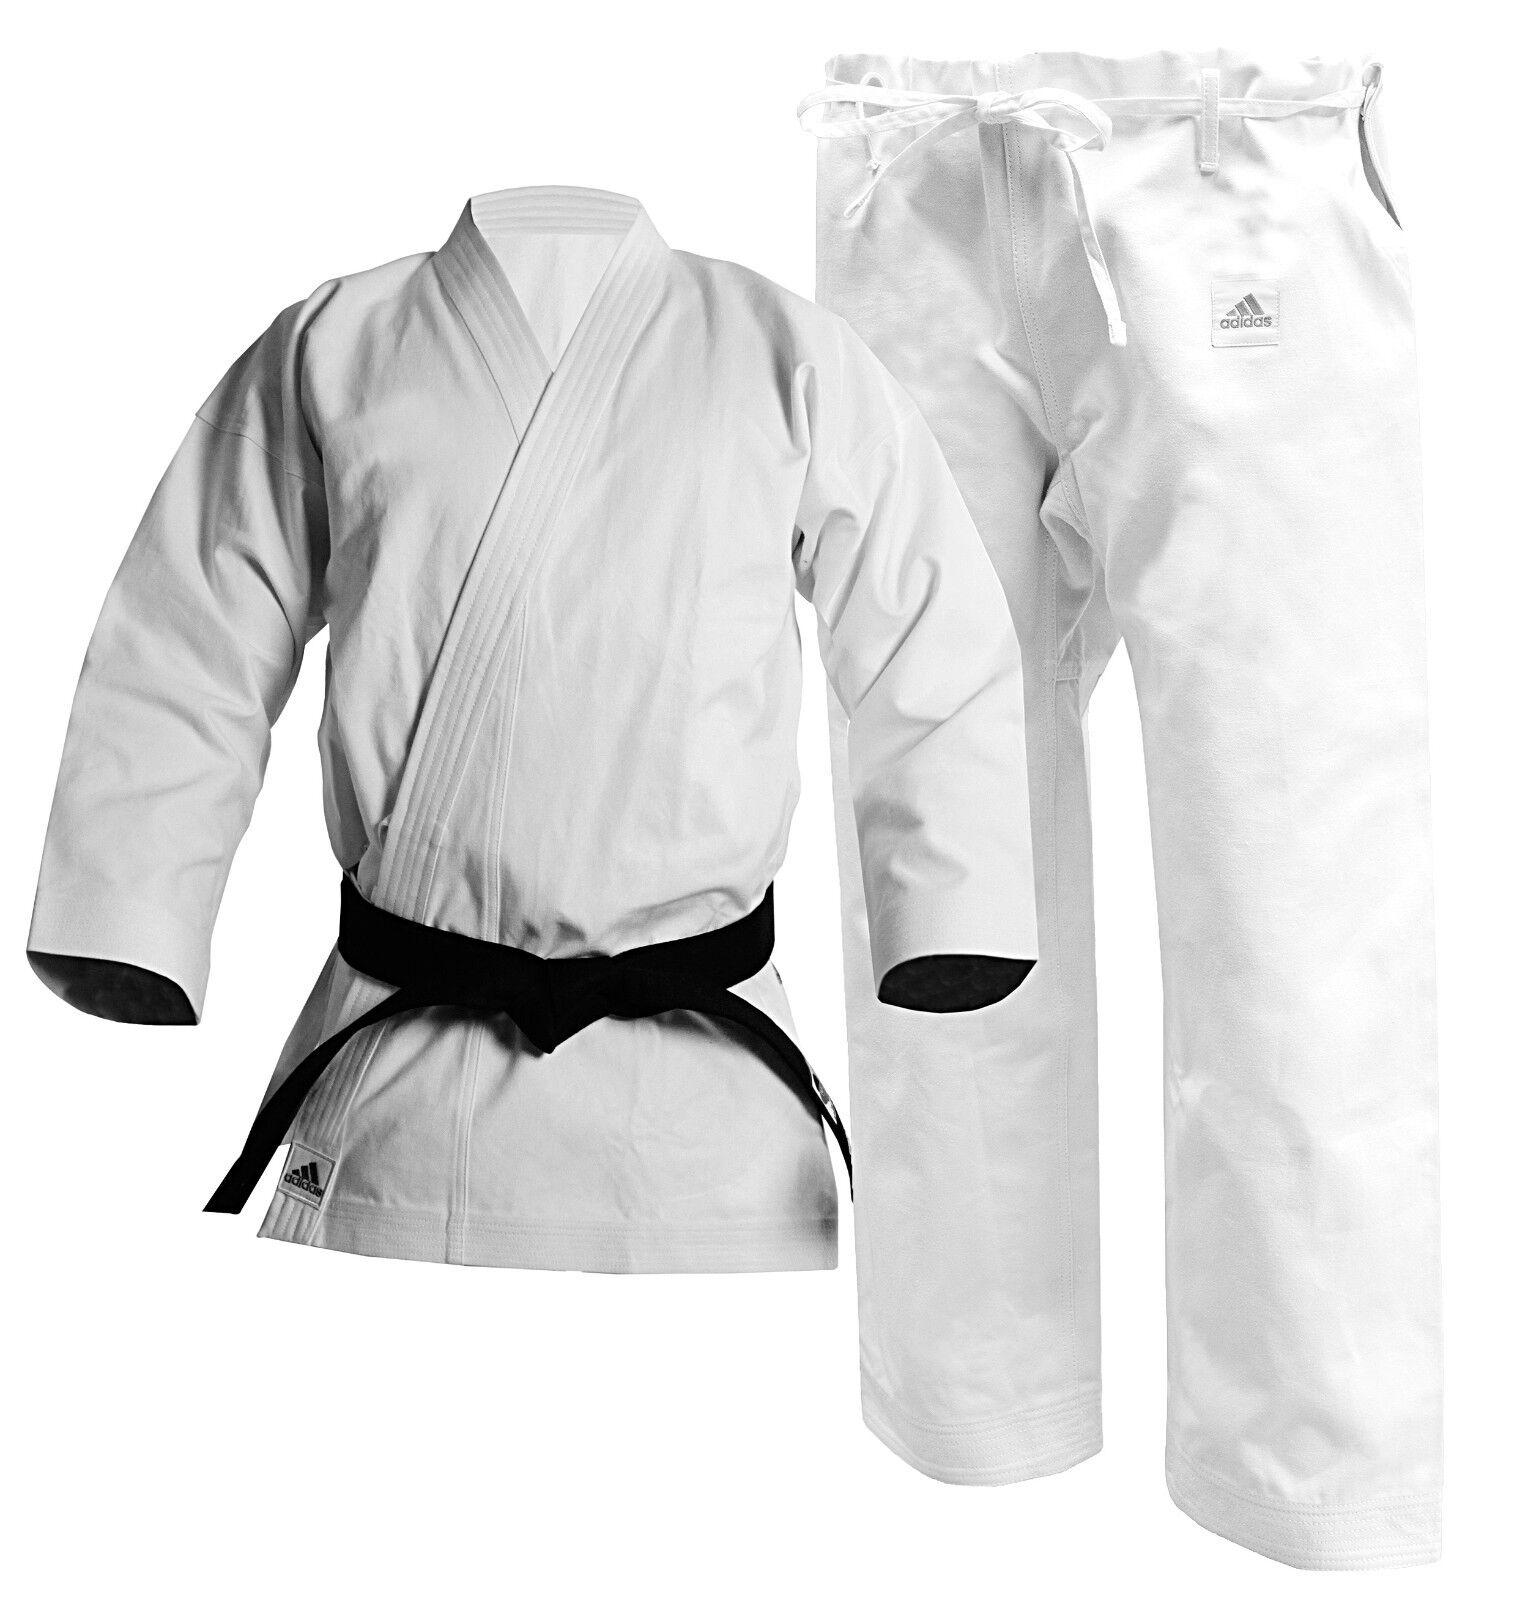 adidas Karate Heavyweight Kata Champion Gi, 14oz Standard Cu